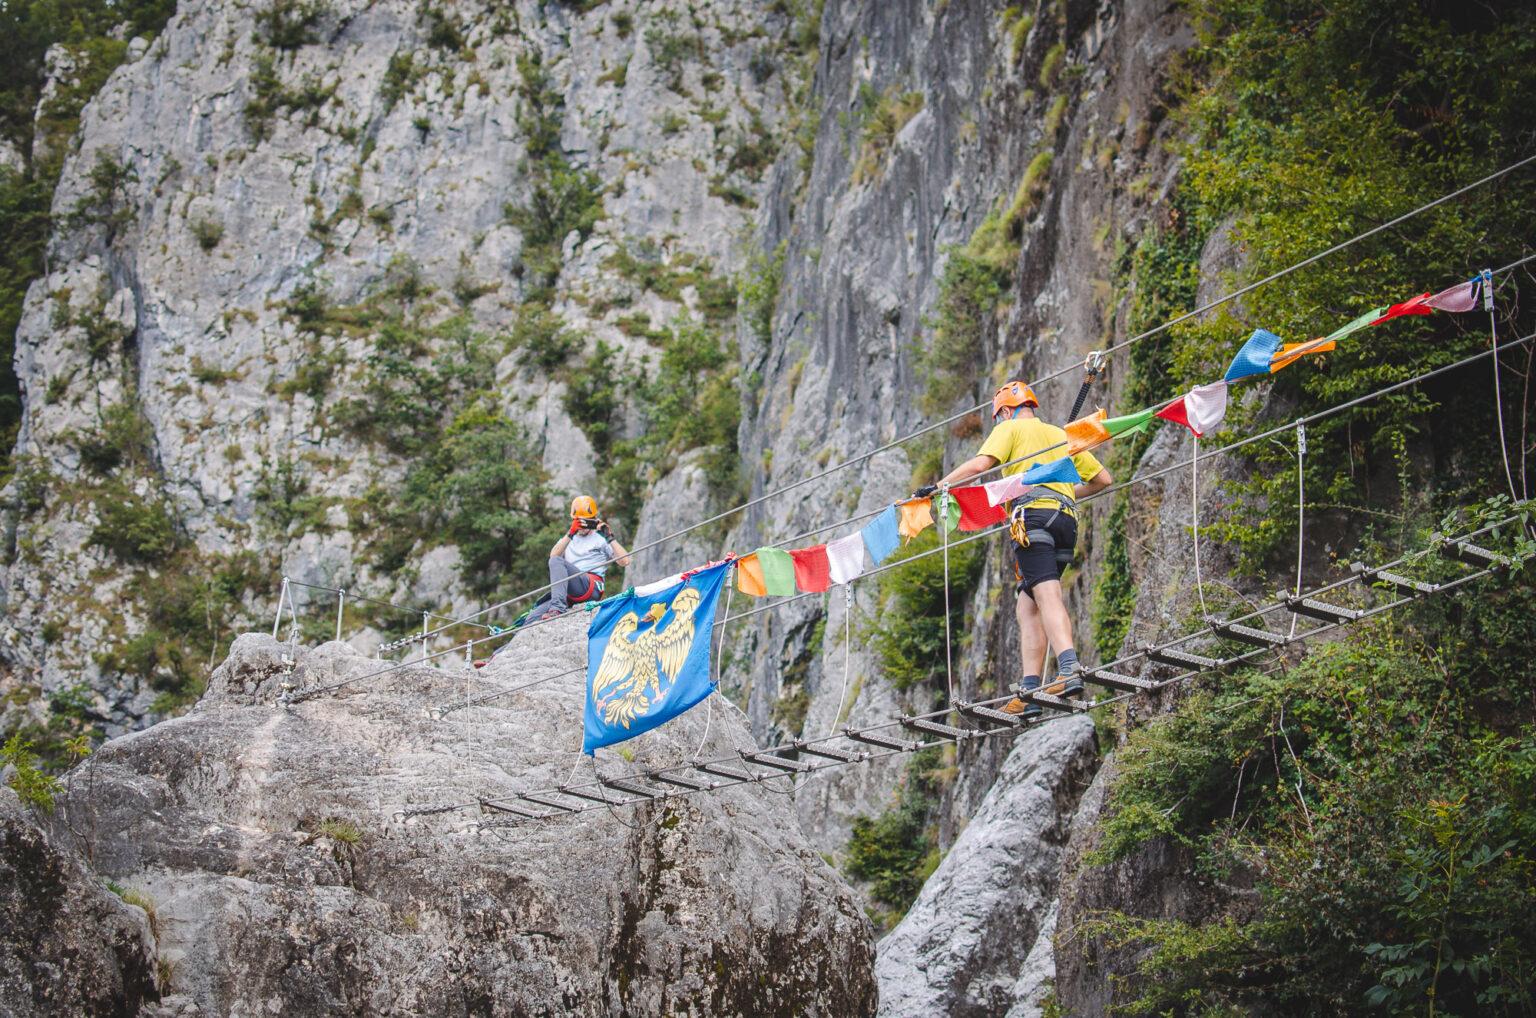 Mostek linowy na ferracie La Farina del Diavolo